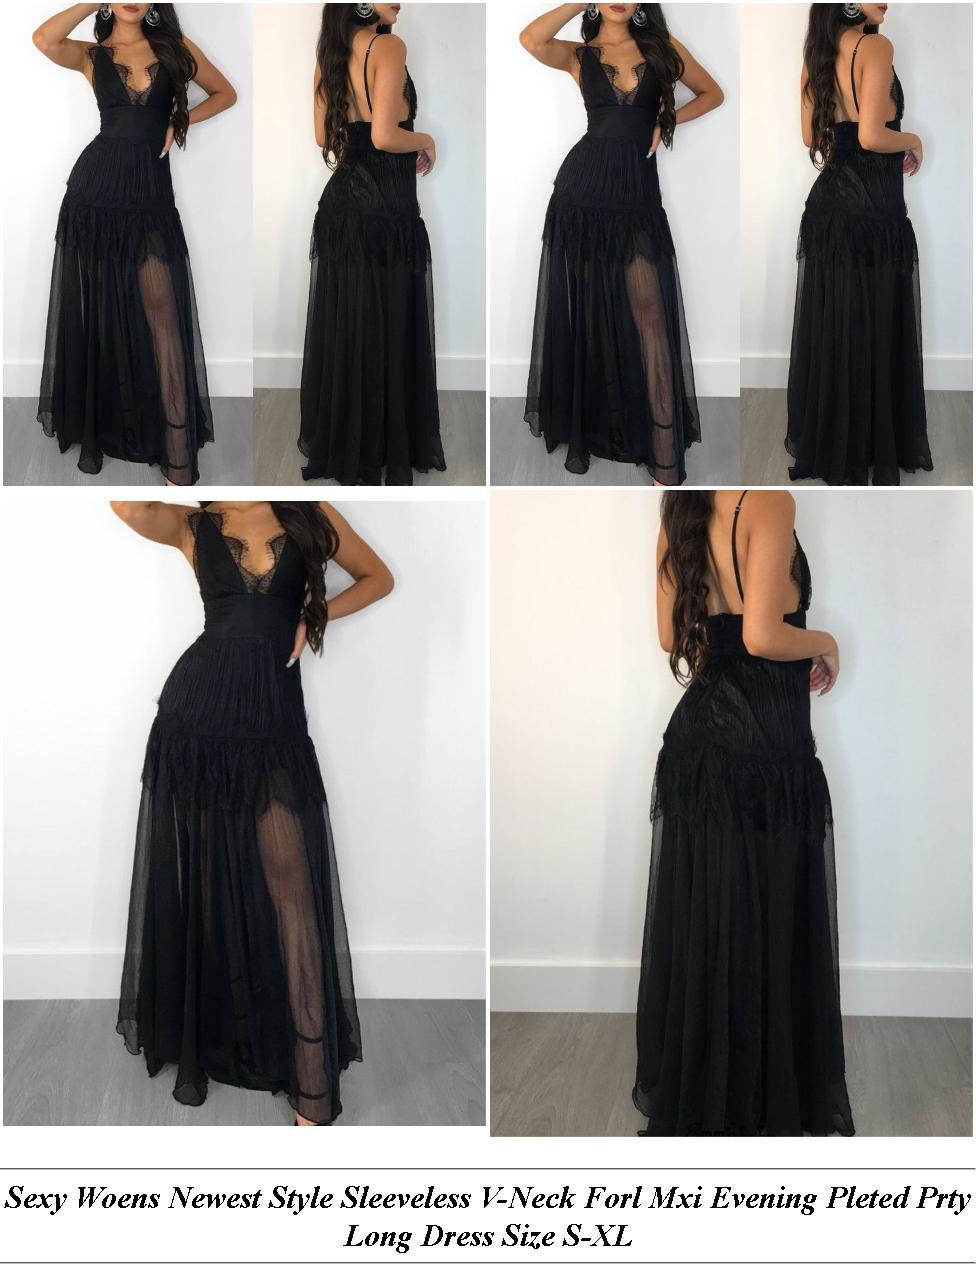 White Gold Dress Meme - Missguided Womens Fashion Clothing Online Shop - Formal Long Dresses Australia